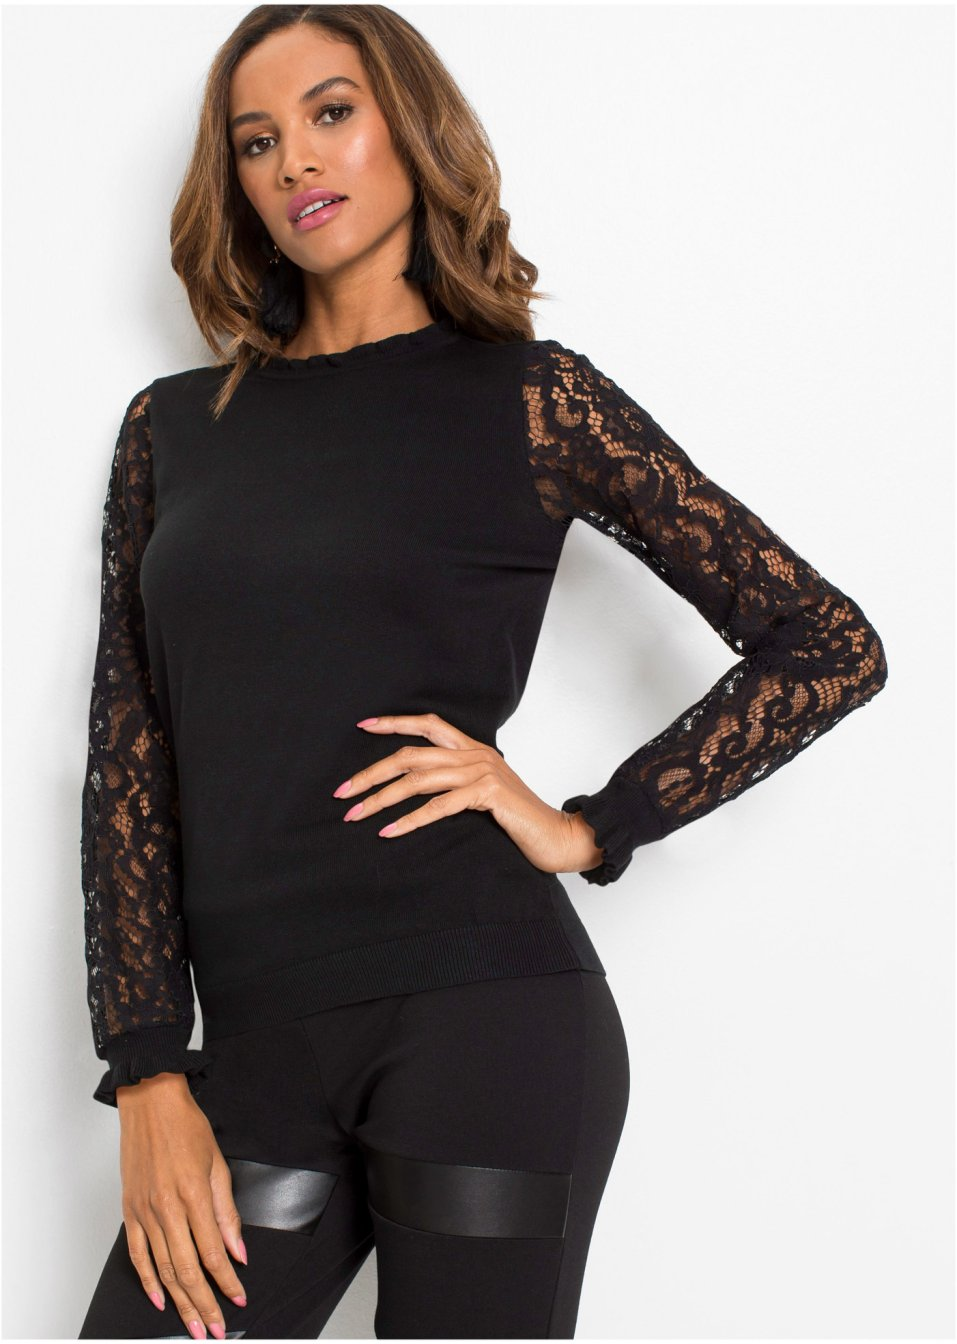 Pullover mit Spitze schwarz - Damen - bonprix.de